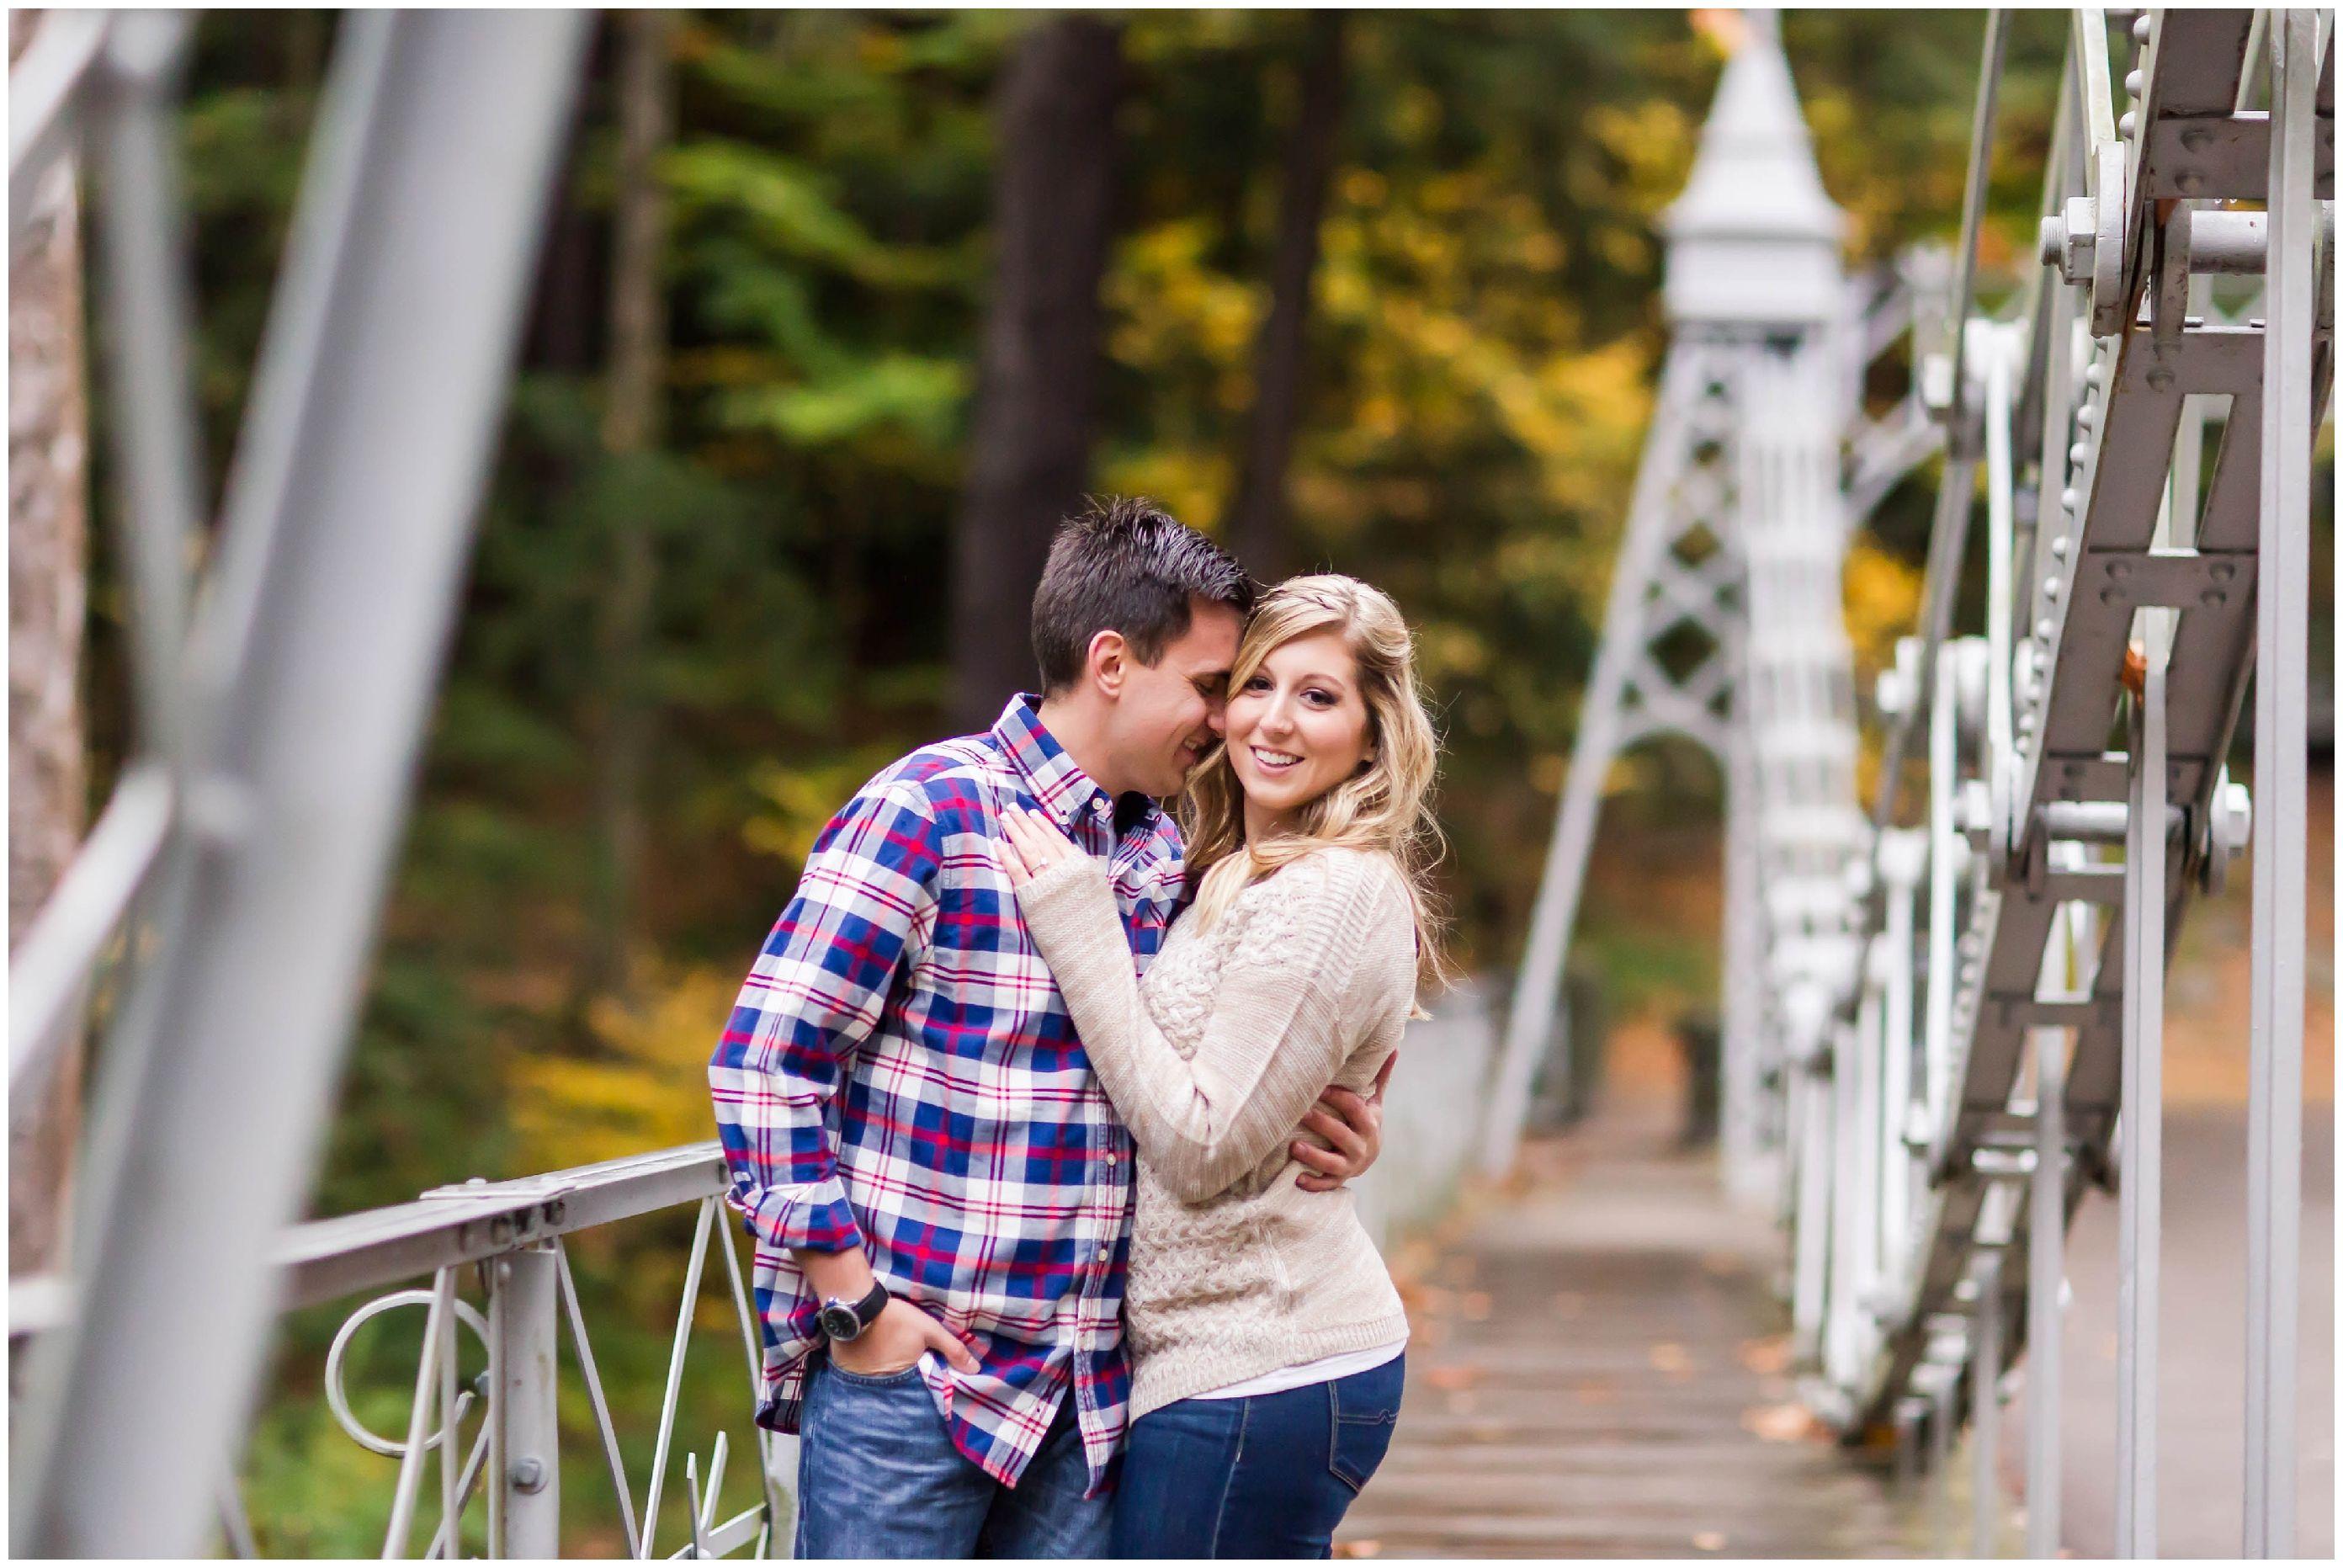 wedding picture locations akron ohio%0A Lanterman u    s Mill Engagement Session Photographer Akron Ohio